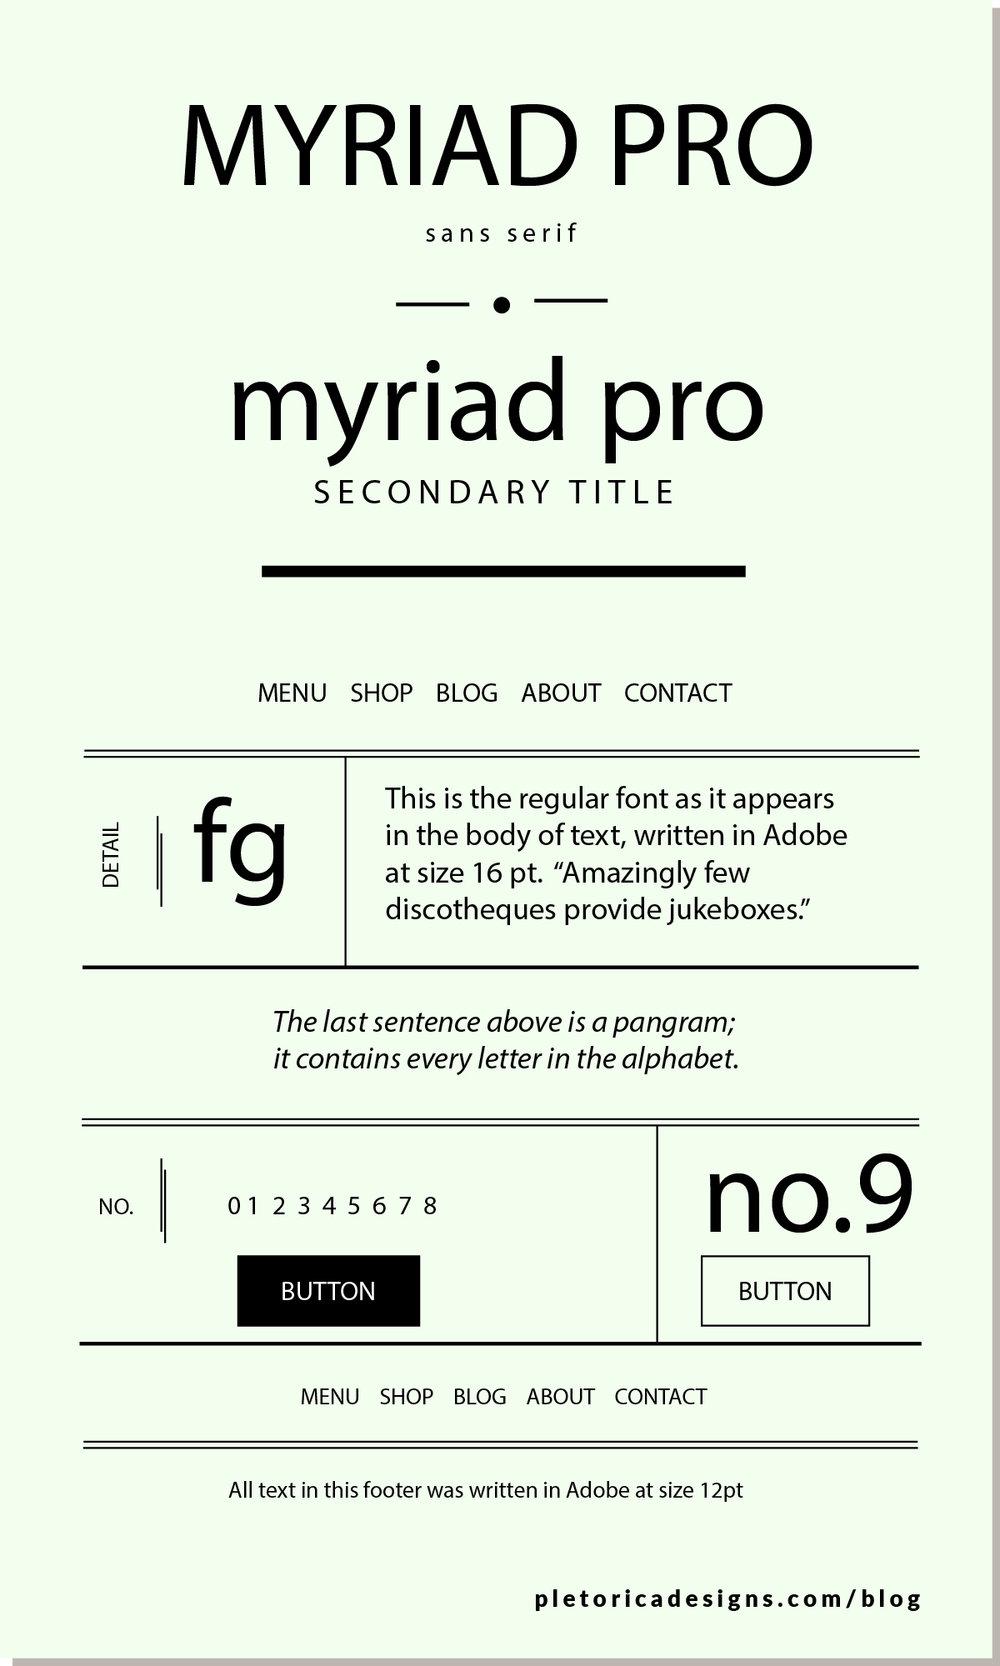 LET'S TYPE: Myriadpro — PLETÓRICA DESIGNS